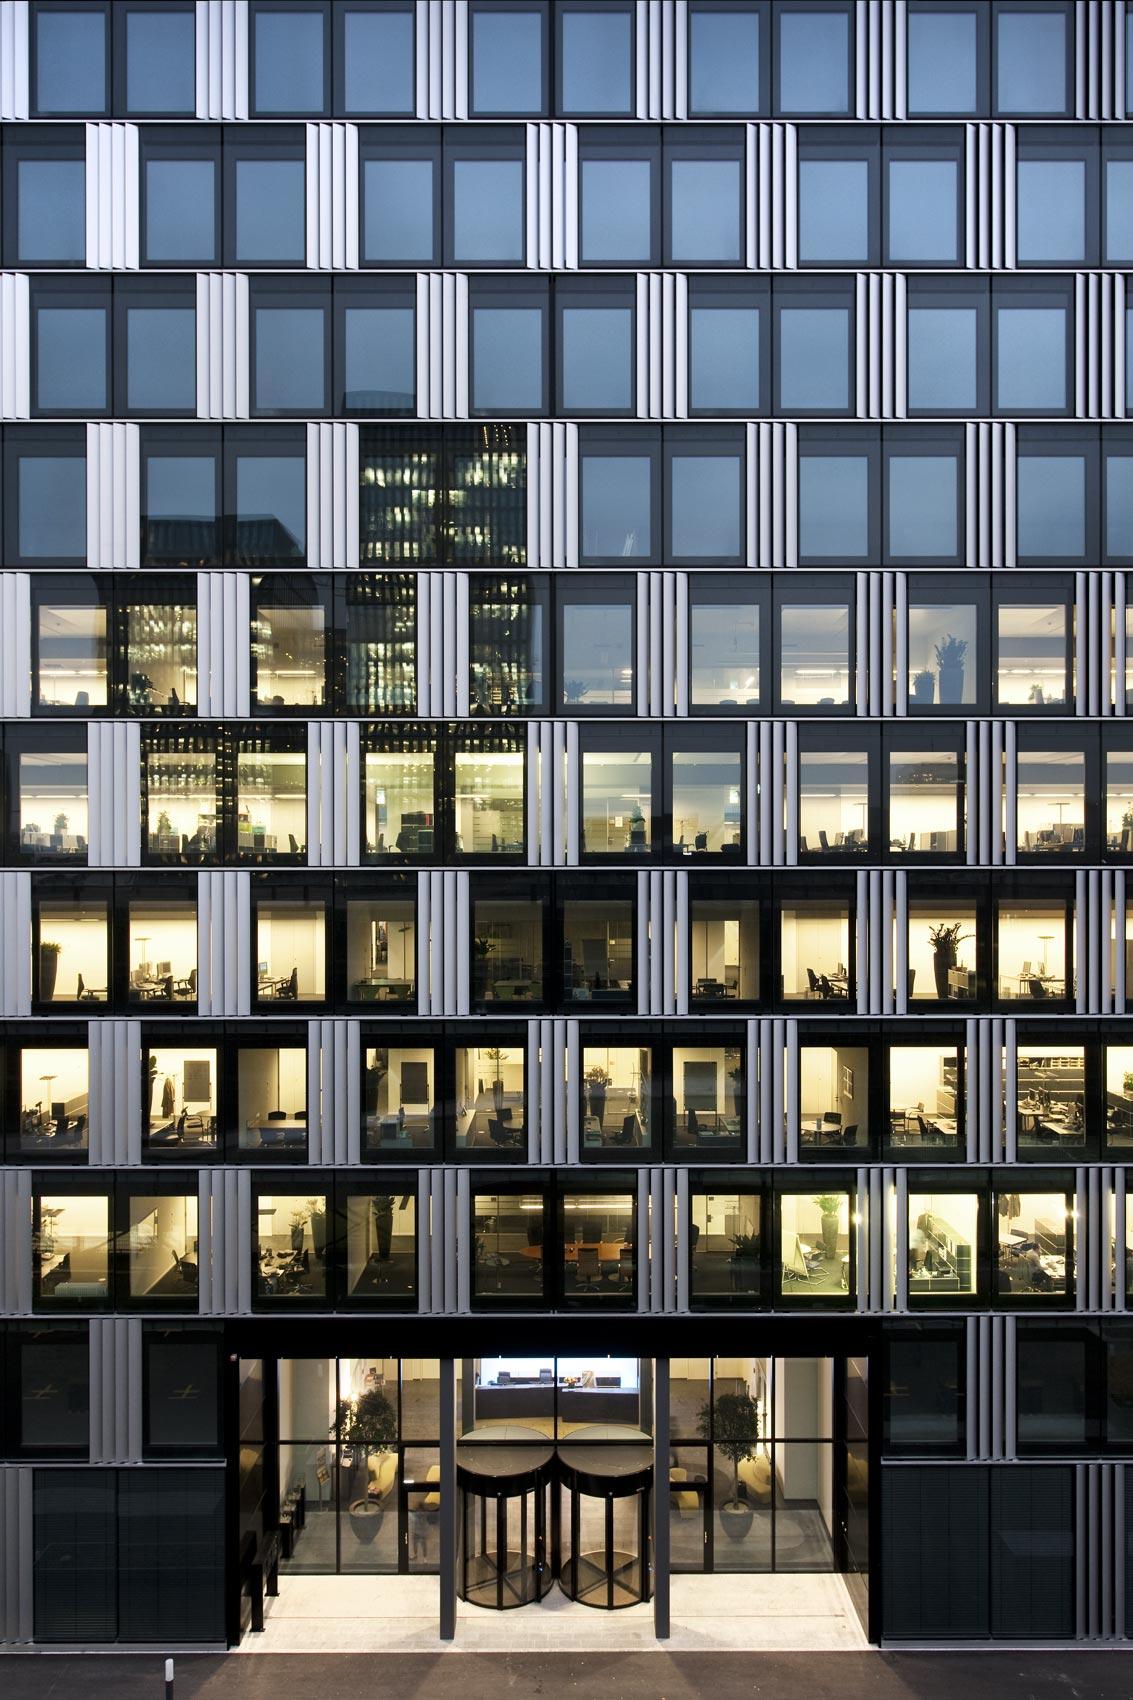 CS, Fassadenbau in Zürich Oerlikon